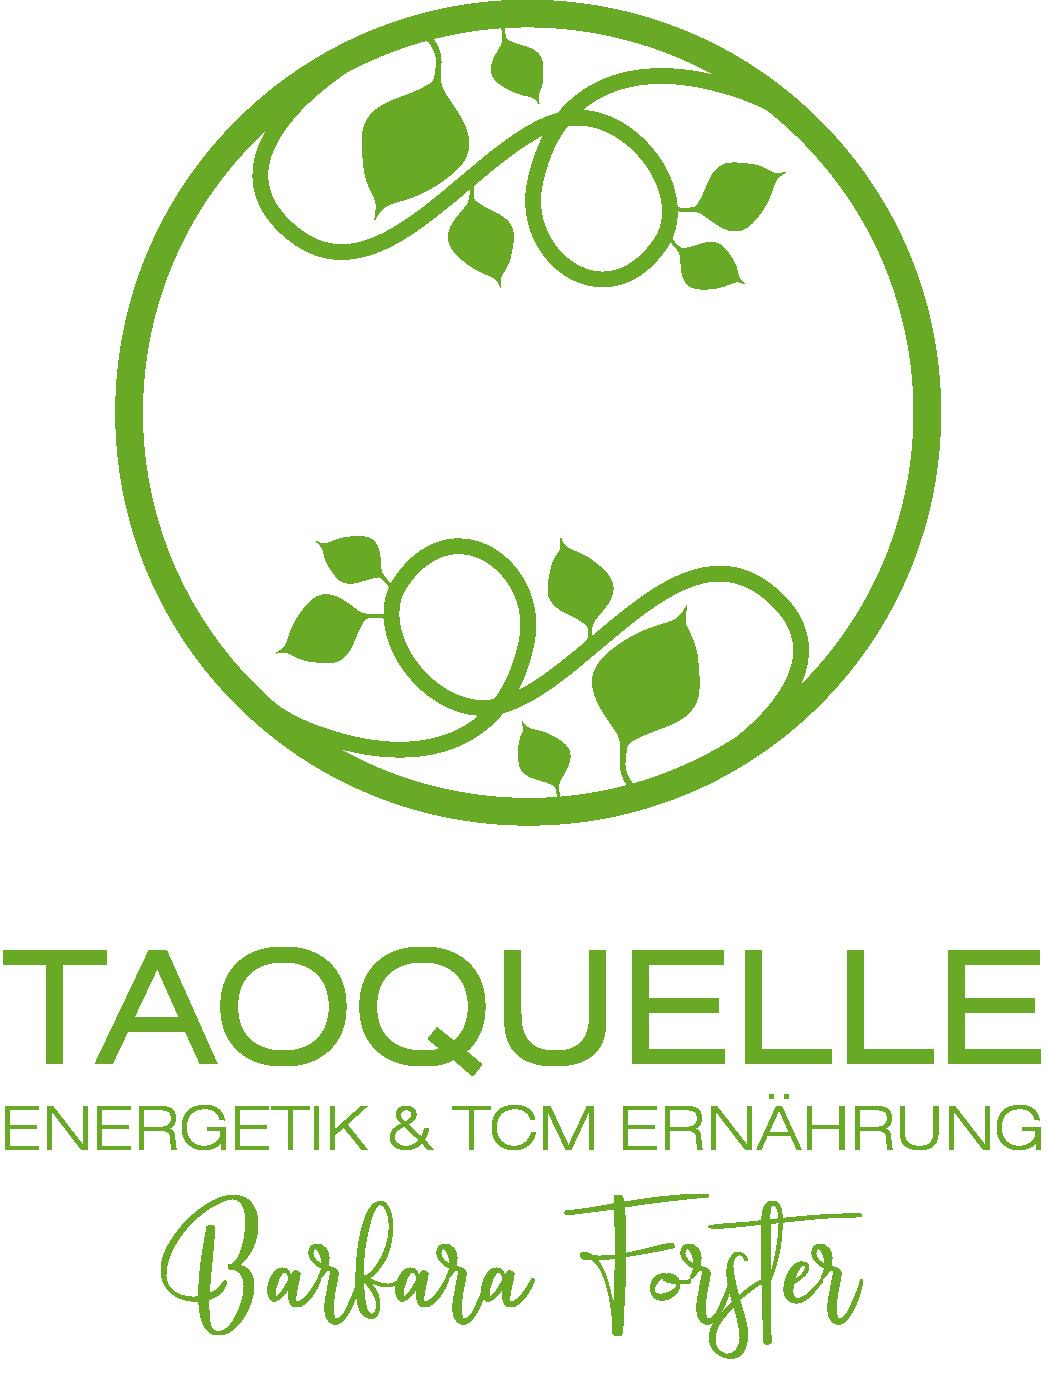 TCM und Energetik